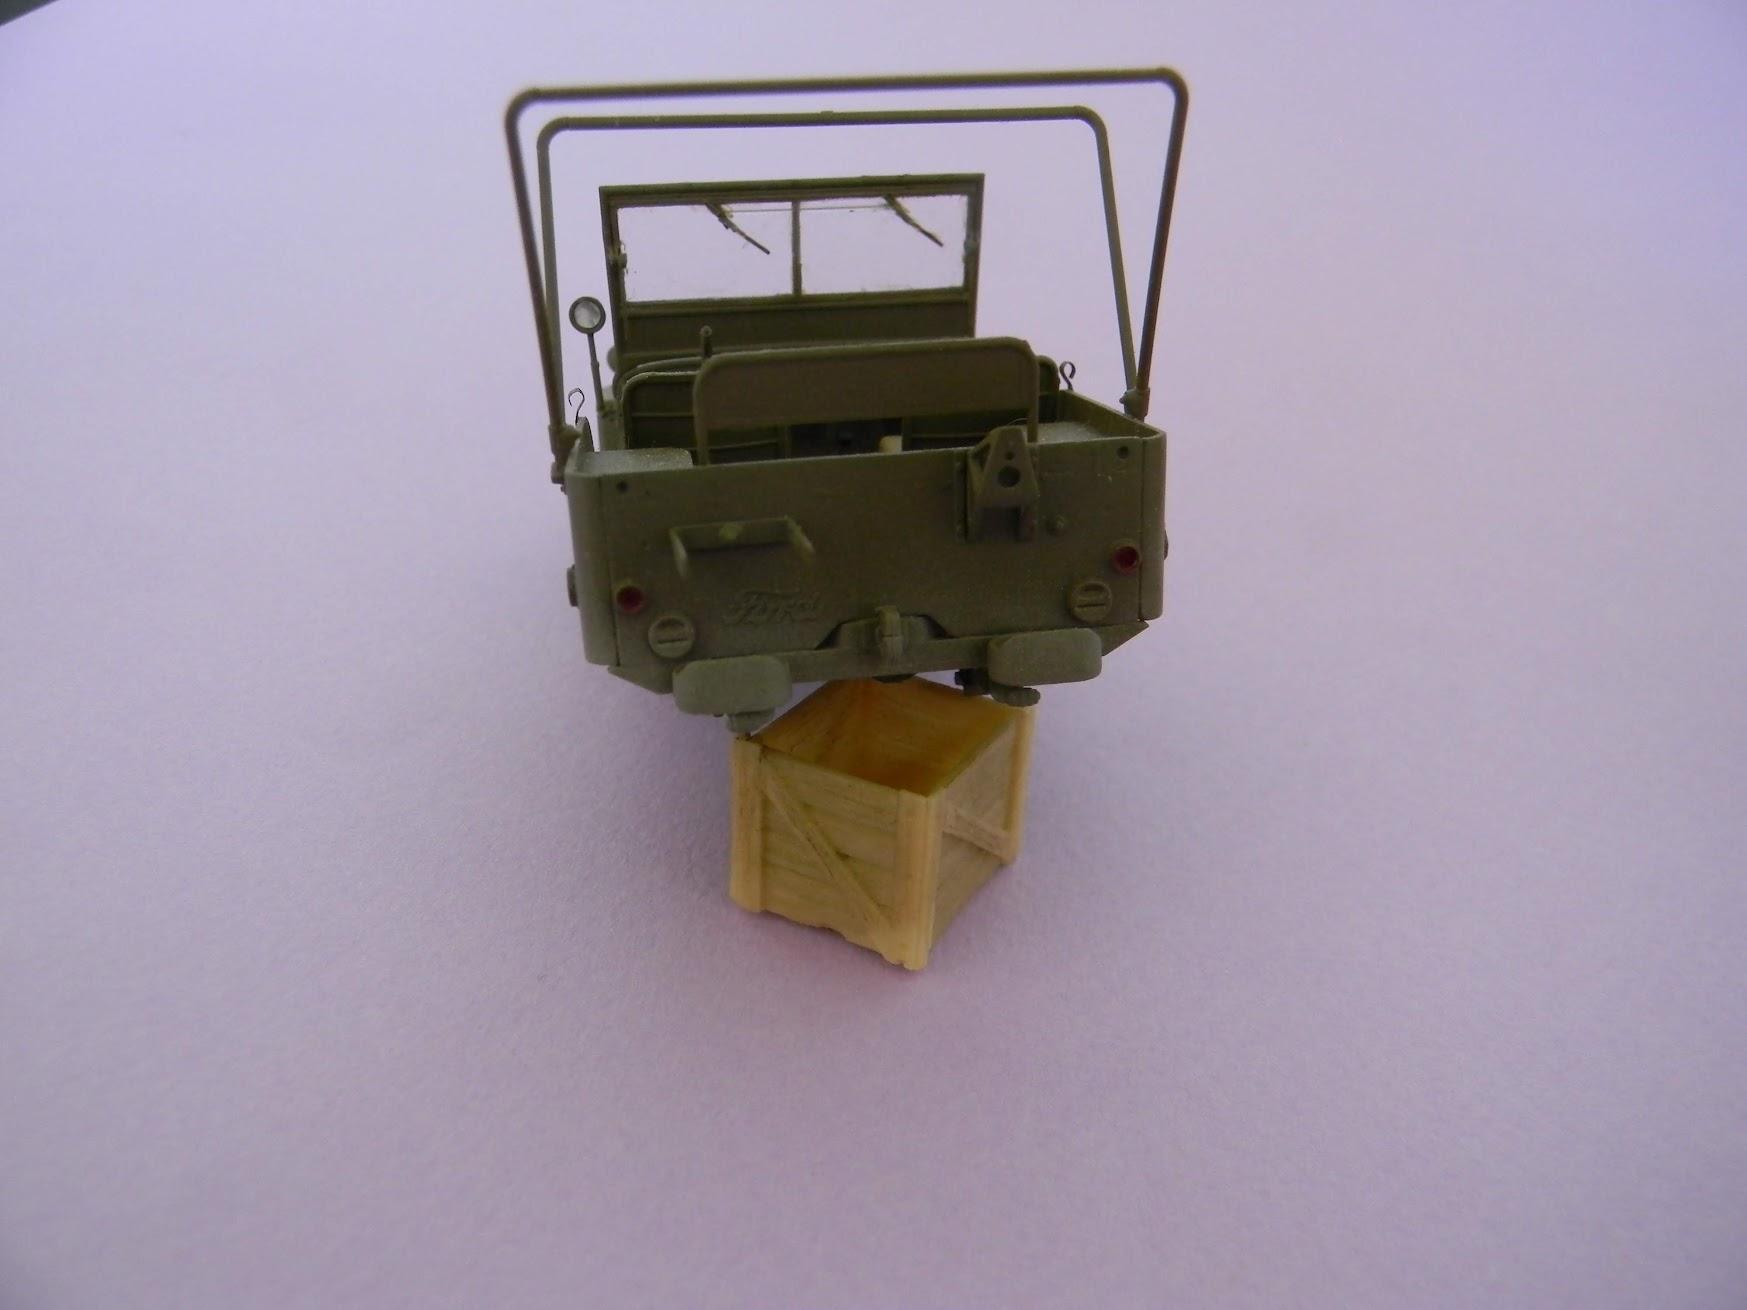 GPW 1942 Ford Bronco Model : revue de détail et montage - Page 5 XJpvQt-WT7KyBU3yNKF_wN7nXgKF2Dy5RhSSk3gUkDT5Of4nAnNjvRlzj-k7ERDGX3dthG4xHLa9Wa3CdrKa5tk3D3ZkzG5PIw9VuiE_jWVzUacJLMzhjq8_tTP3WLb8jyjTYP0ASzkBLMwDouRck5zQl0dzenkQX3oU8x-afGwkUPZwyc1v8vTm5F4qIi-rjxf_UxlTU2SyxD__Aa53nA1m9-3WQezl_oRZQzWmkW8ie1vcmaQxLa29BgIEVg5-3gtP7hDeBEAUkS43YhaL4MNvlOPgALV-X8LMdVBaZ-2e-t9bB2Ukg1C3RAug0wK82d093Qy-18h4_Q9px_1OVmw_Gtj7H2N-cycnau9Q1D-vGIZ1lGTQnLks_nPrKI5w6XtvBijUwpPN5XZsqH_C9sFf5TIJ7IcWWOWH6G103FP6nZg7NZqr7ZqTj7ZmaFpm9JpnOZrLQYWw582Y-IYYH16jYBnJu39SGmyij7g2Hz3U2G2WjR1_yC2rVnRqXCdlkaxXP0b1bTOAdMae--TP6T7Djem7V6Qj9UIGHcxCRDMH8UW0yk_sxtjJ3py43y1M4cZalkb_7bbDZocgKoQnlLGaAMKE2O-_dvDjMWj9cA4hdWNyGmHfMtiKkXNvTThDhurr-zuVzTEzEytAS-A7oYpAp4DlRmnqKonTTaKsnKoTocjf95-anAuQ69N1SK7Uoyh0NeEtWn94tTJhfuY7_BmVhjNEMVWpEywtmTr7IiwRR_r8Qw=w1747-h1310-no